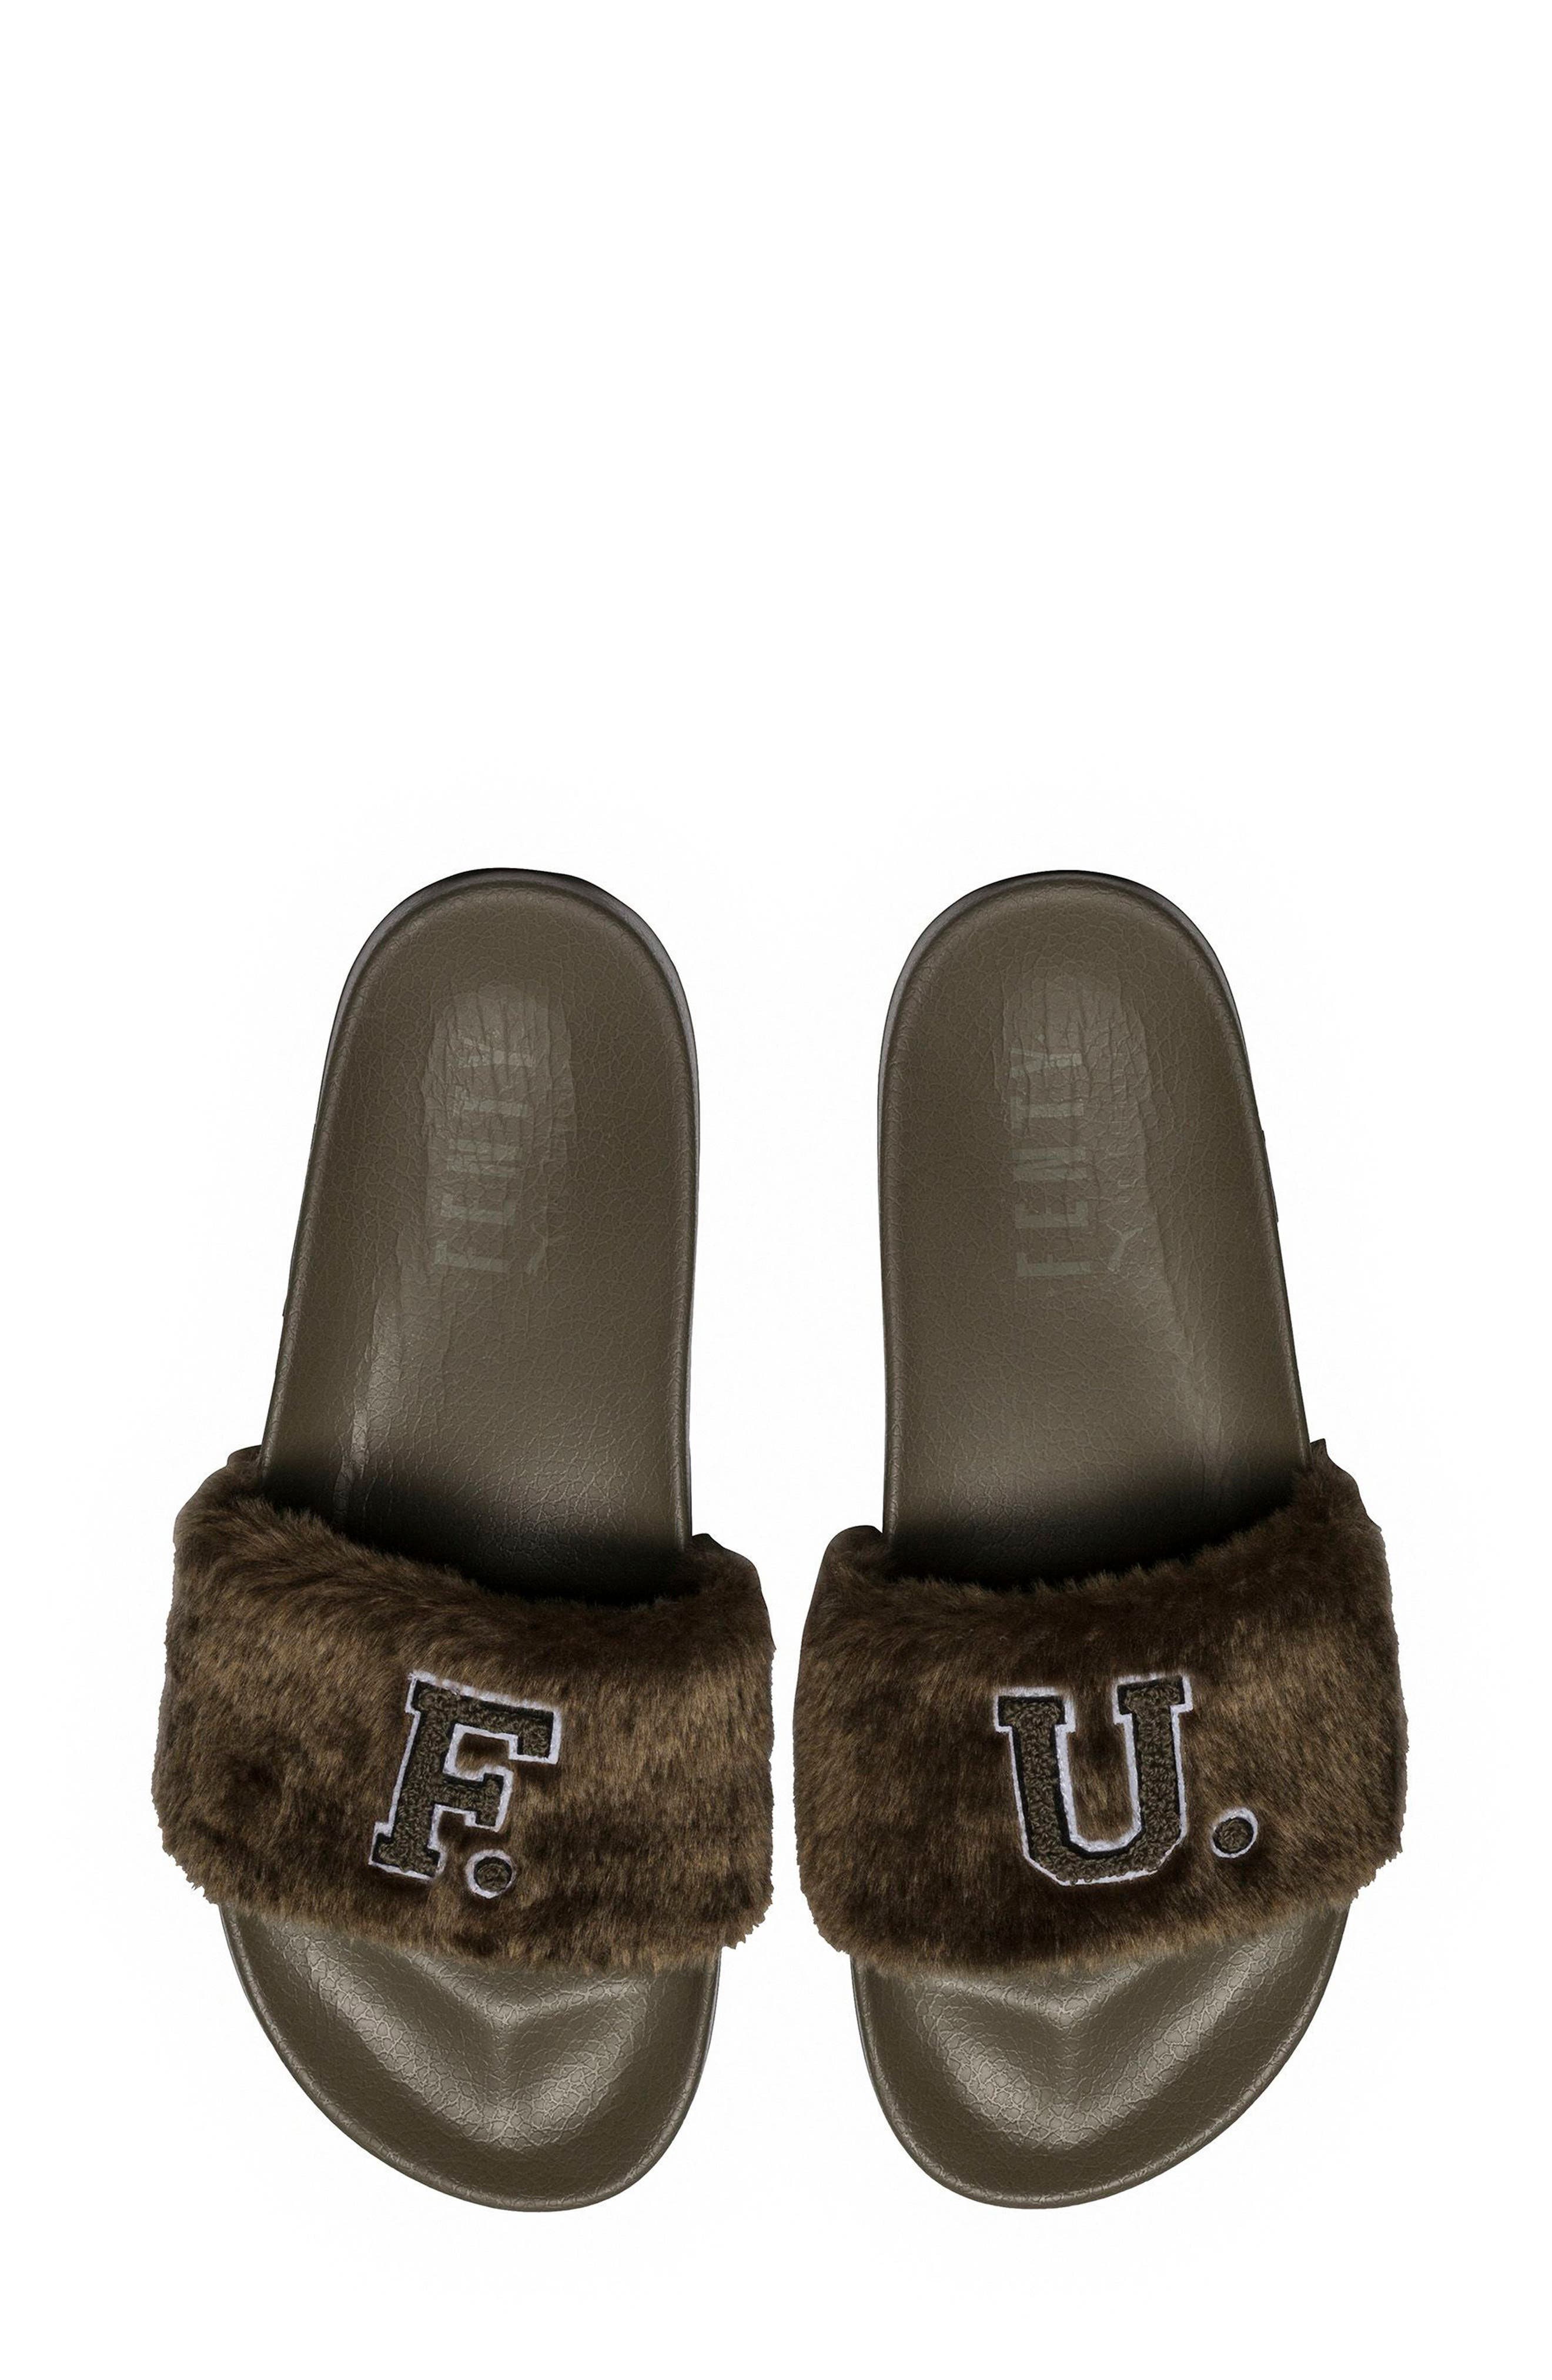 Main Image - FENTY PUMA by Rihanna Lead Cat Slide Sandals (Women)